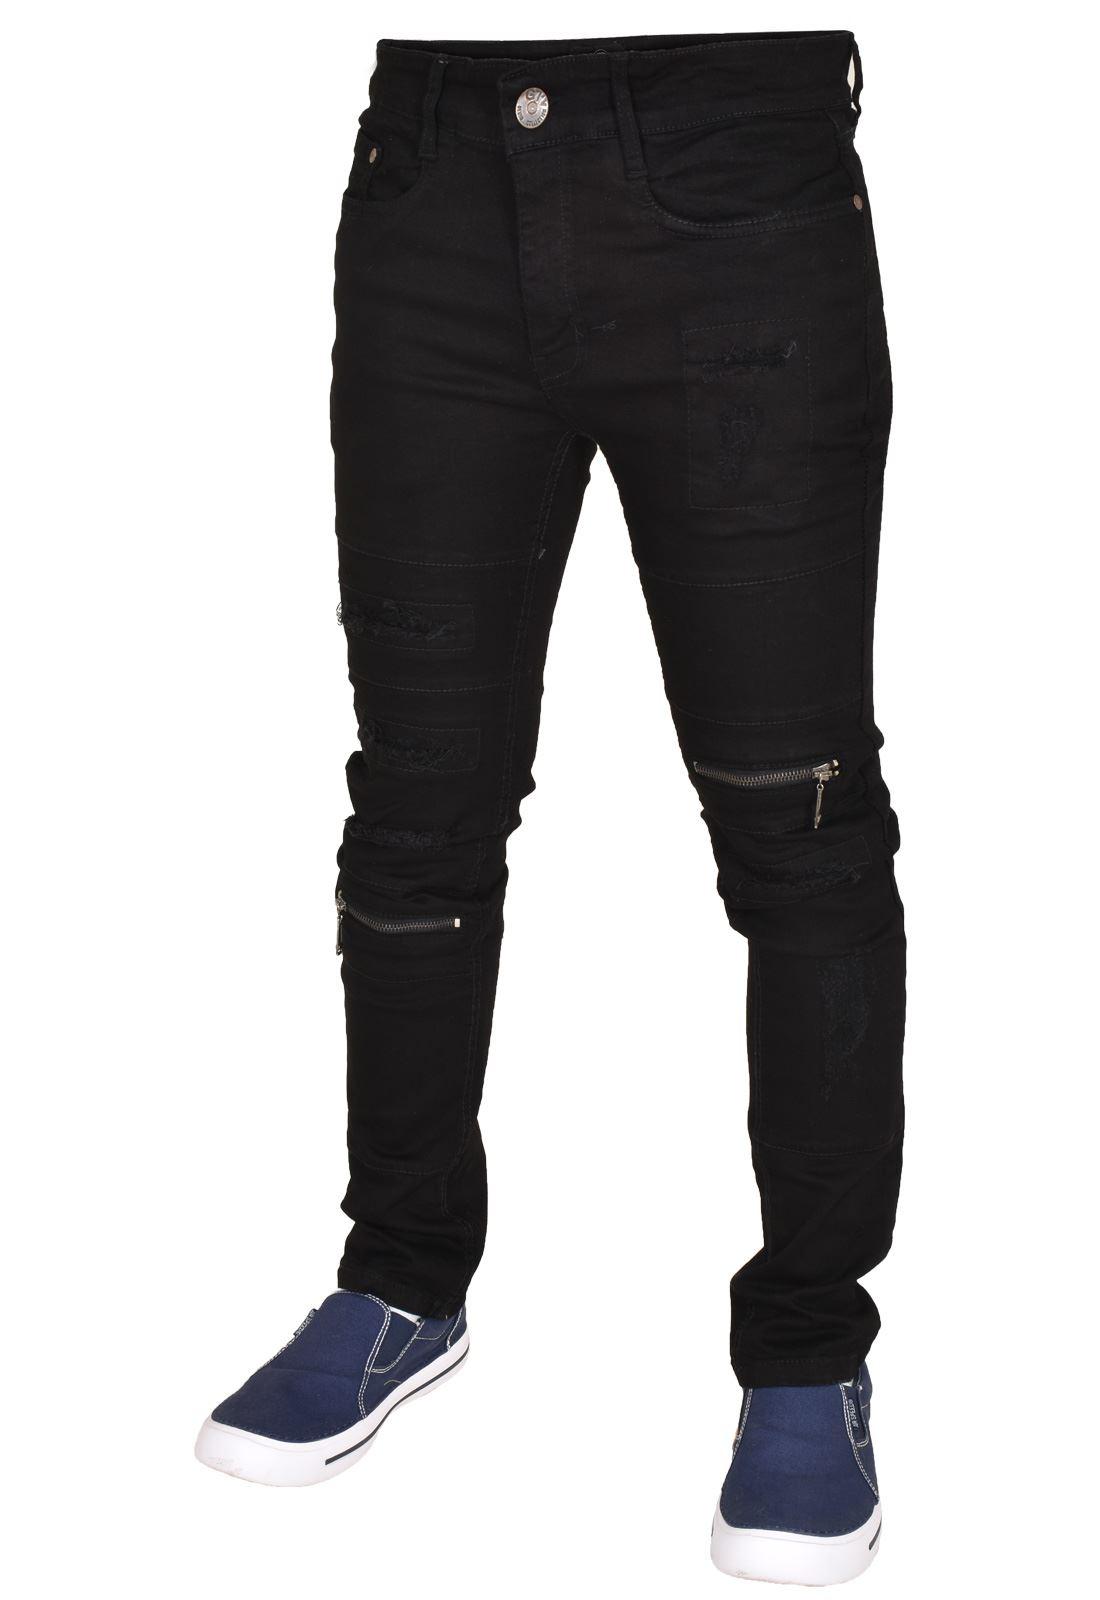 G72 Mens Ripped Straight Leg Zip Fly Skinny Fit Jeans Western Denim Zipper Pants